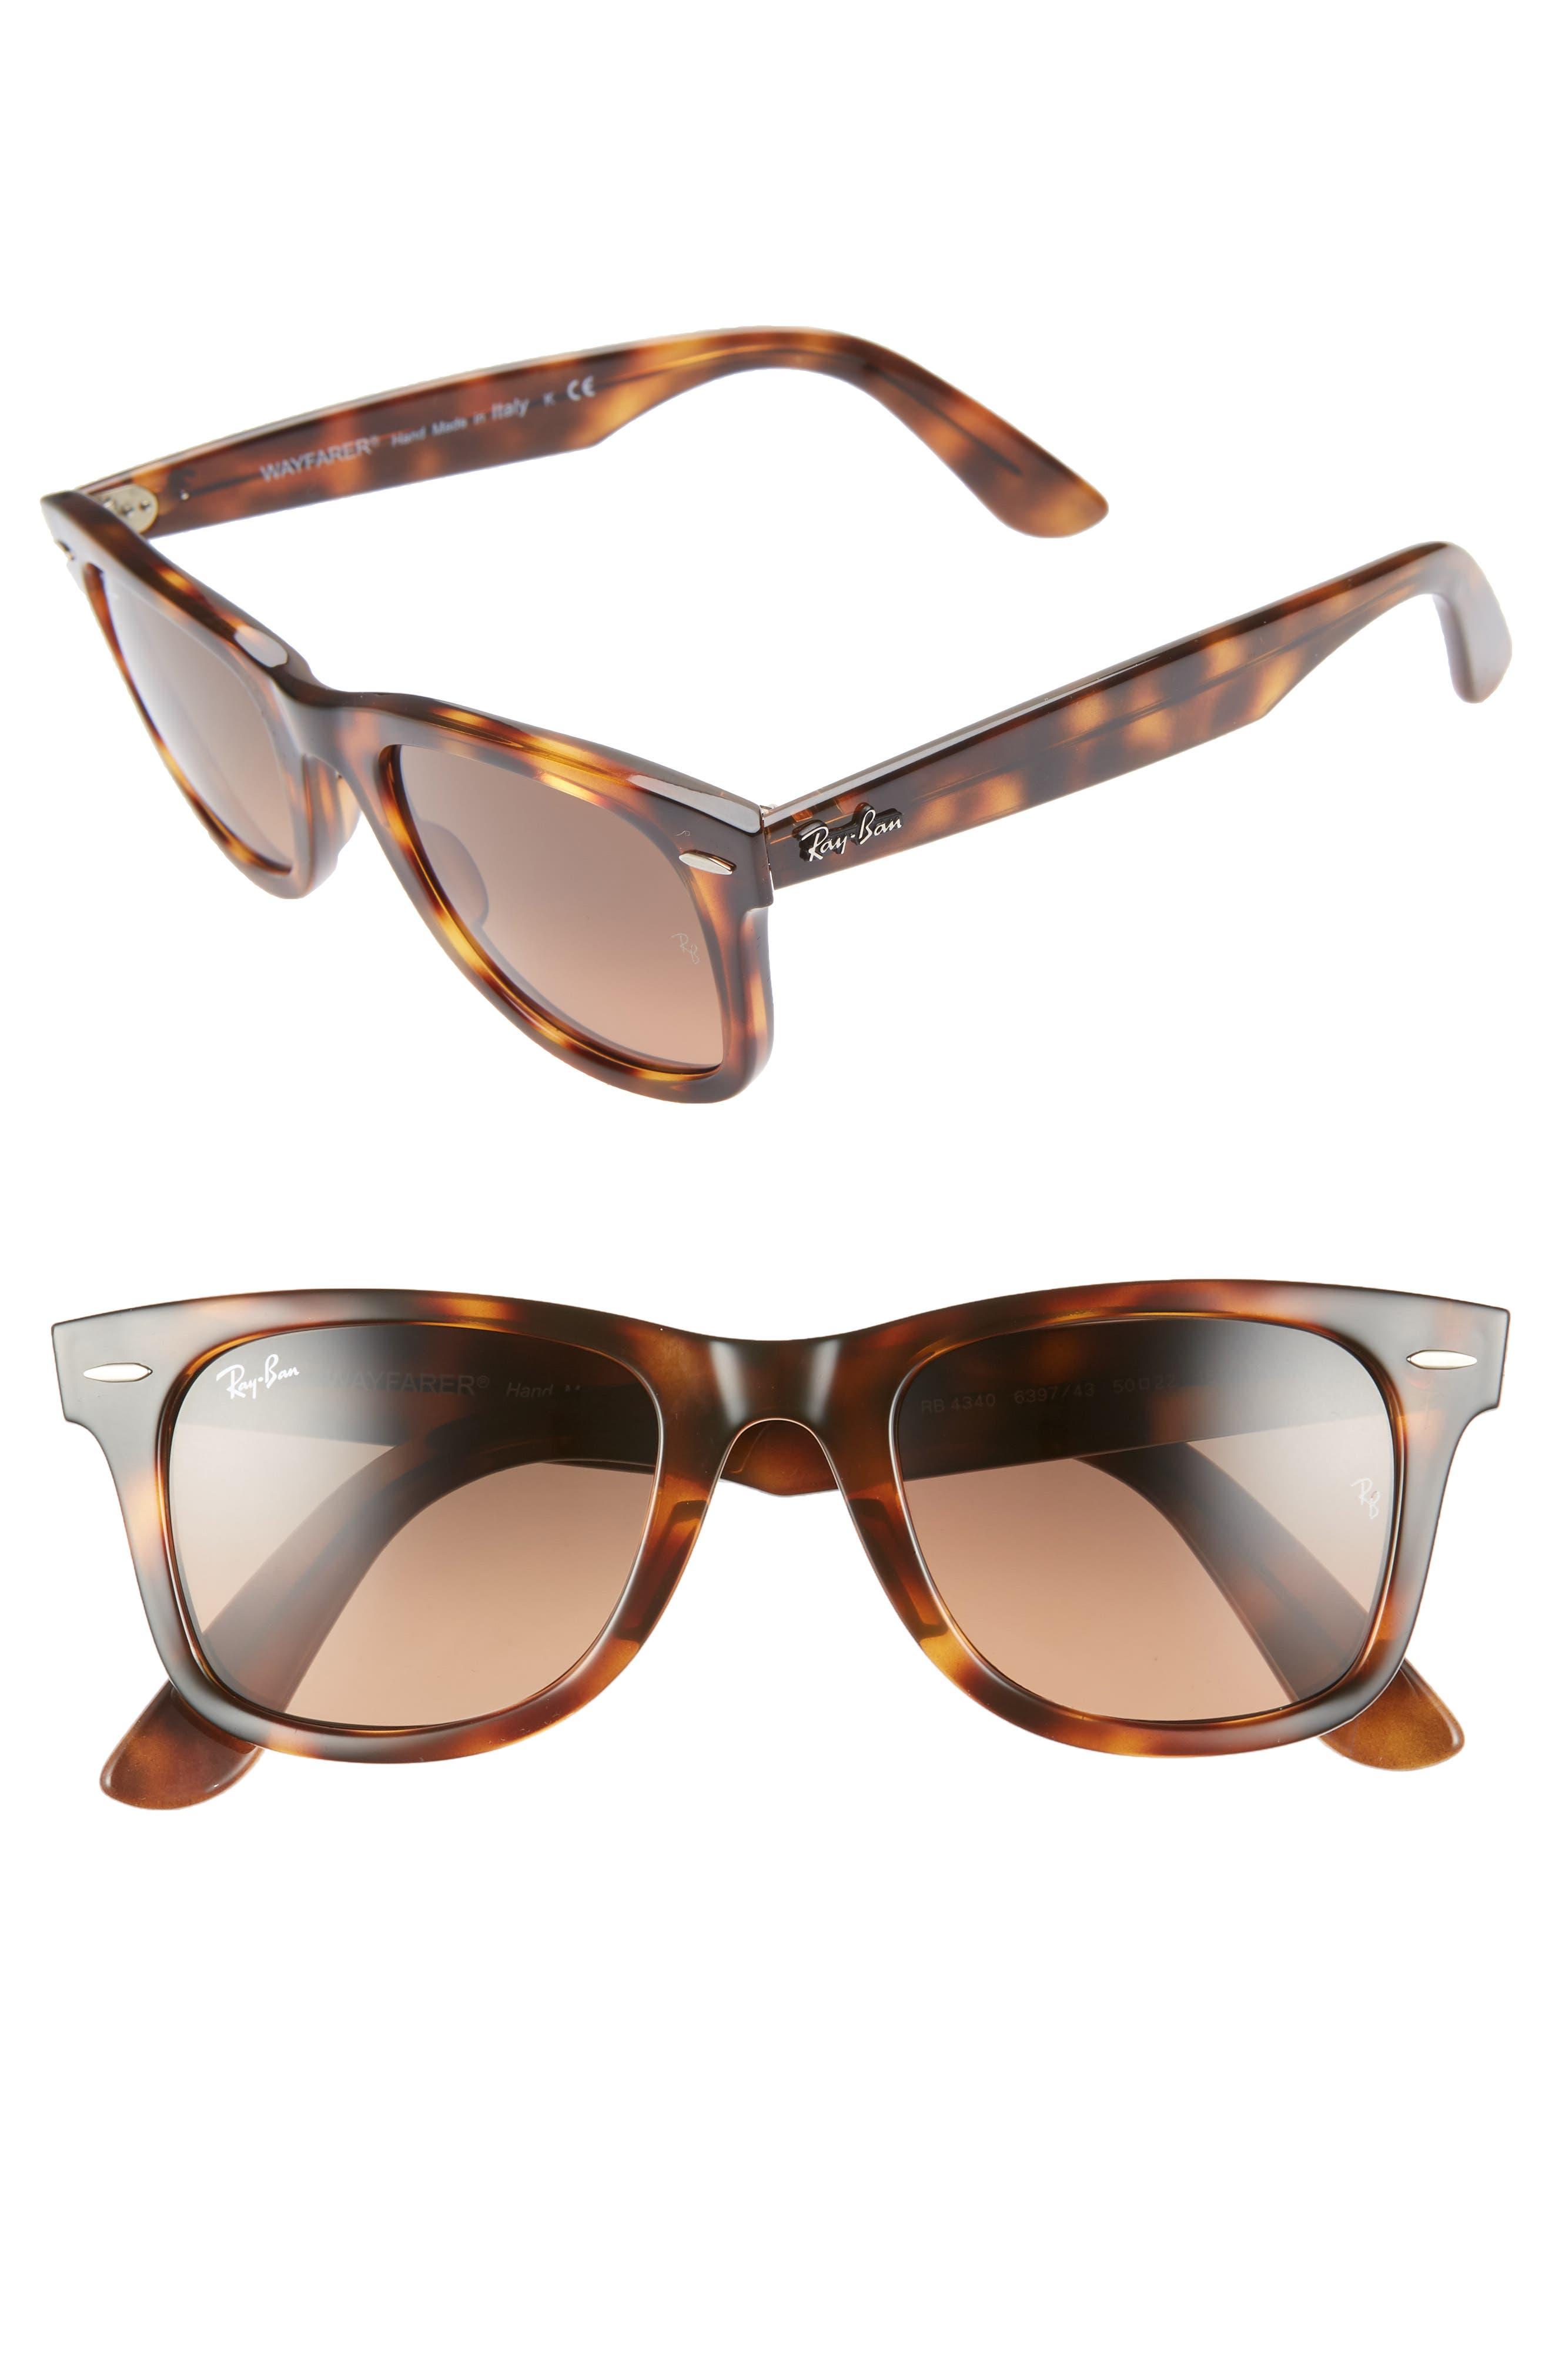 Ray-Ban 50Mm Wayfarer Ease Gradient Sunglasses - Brown/ Grey Gradient